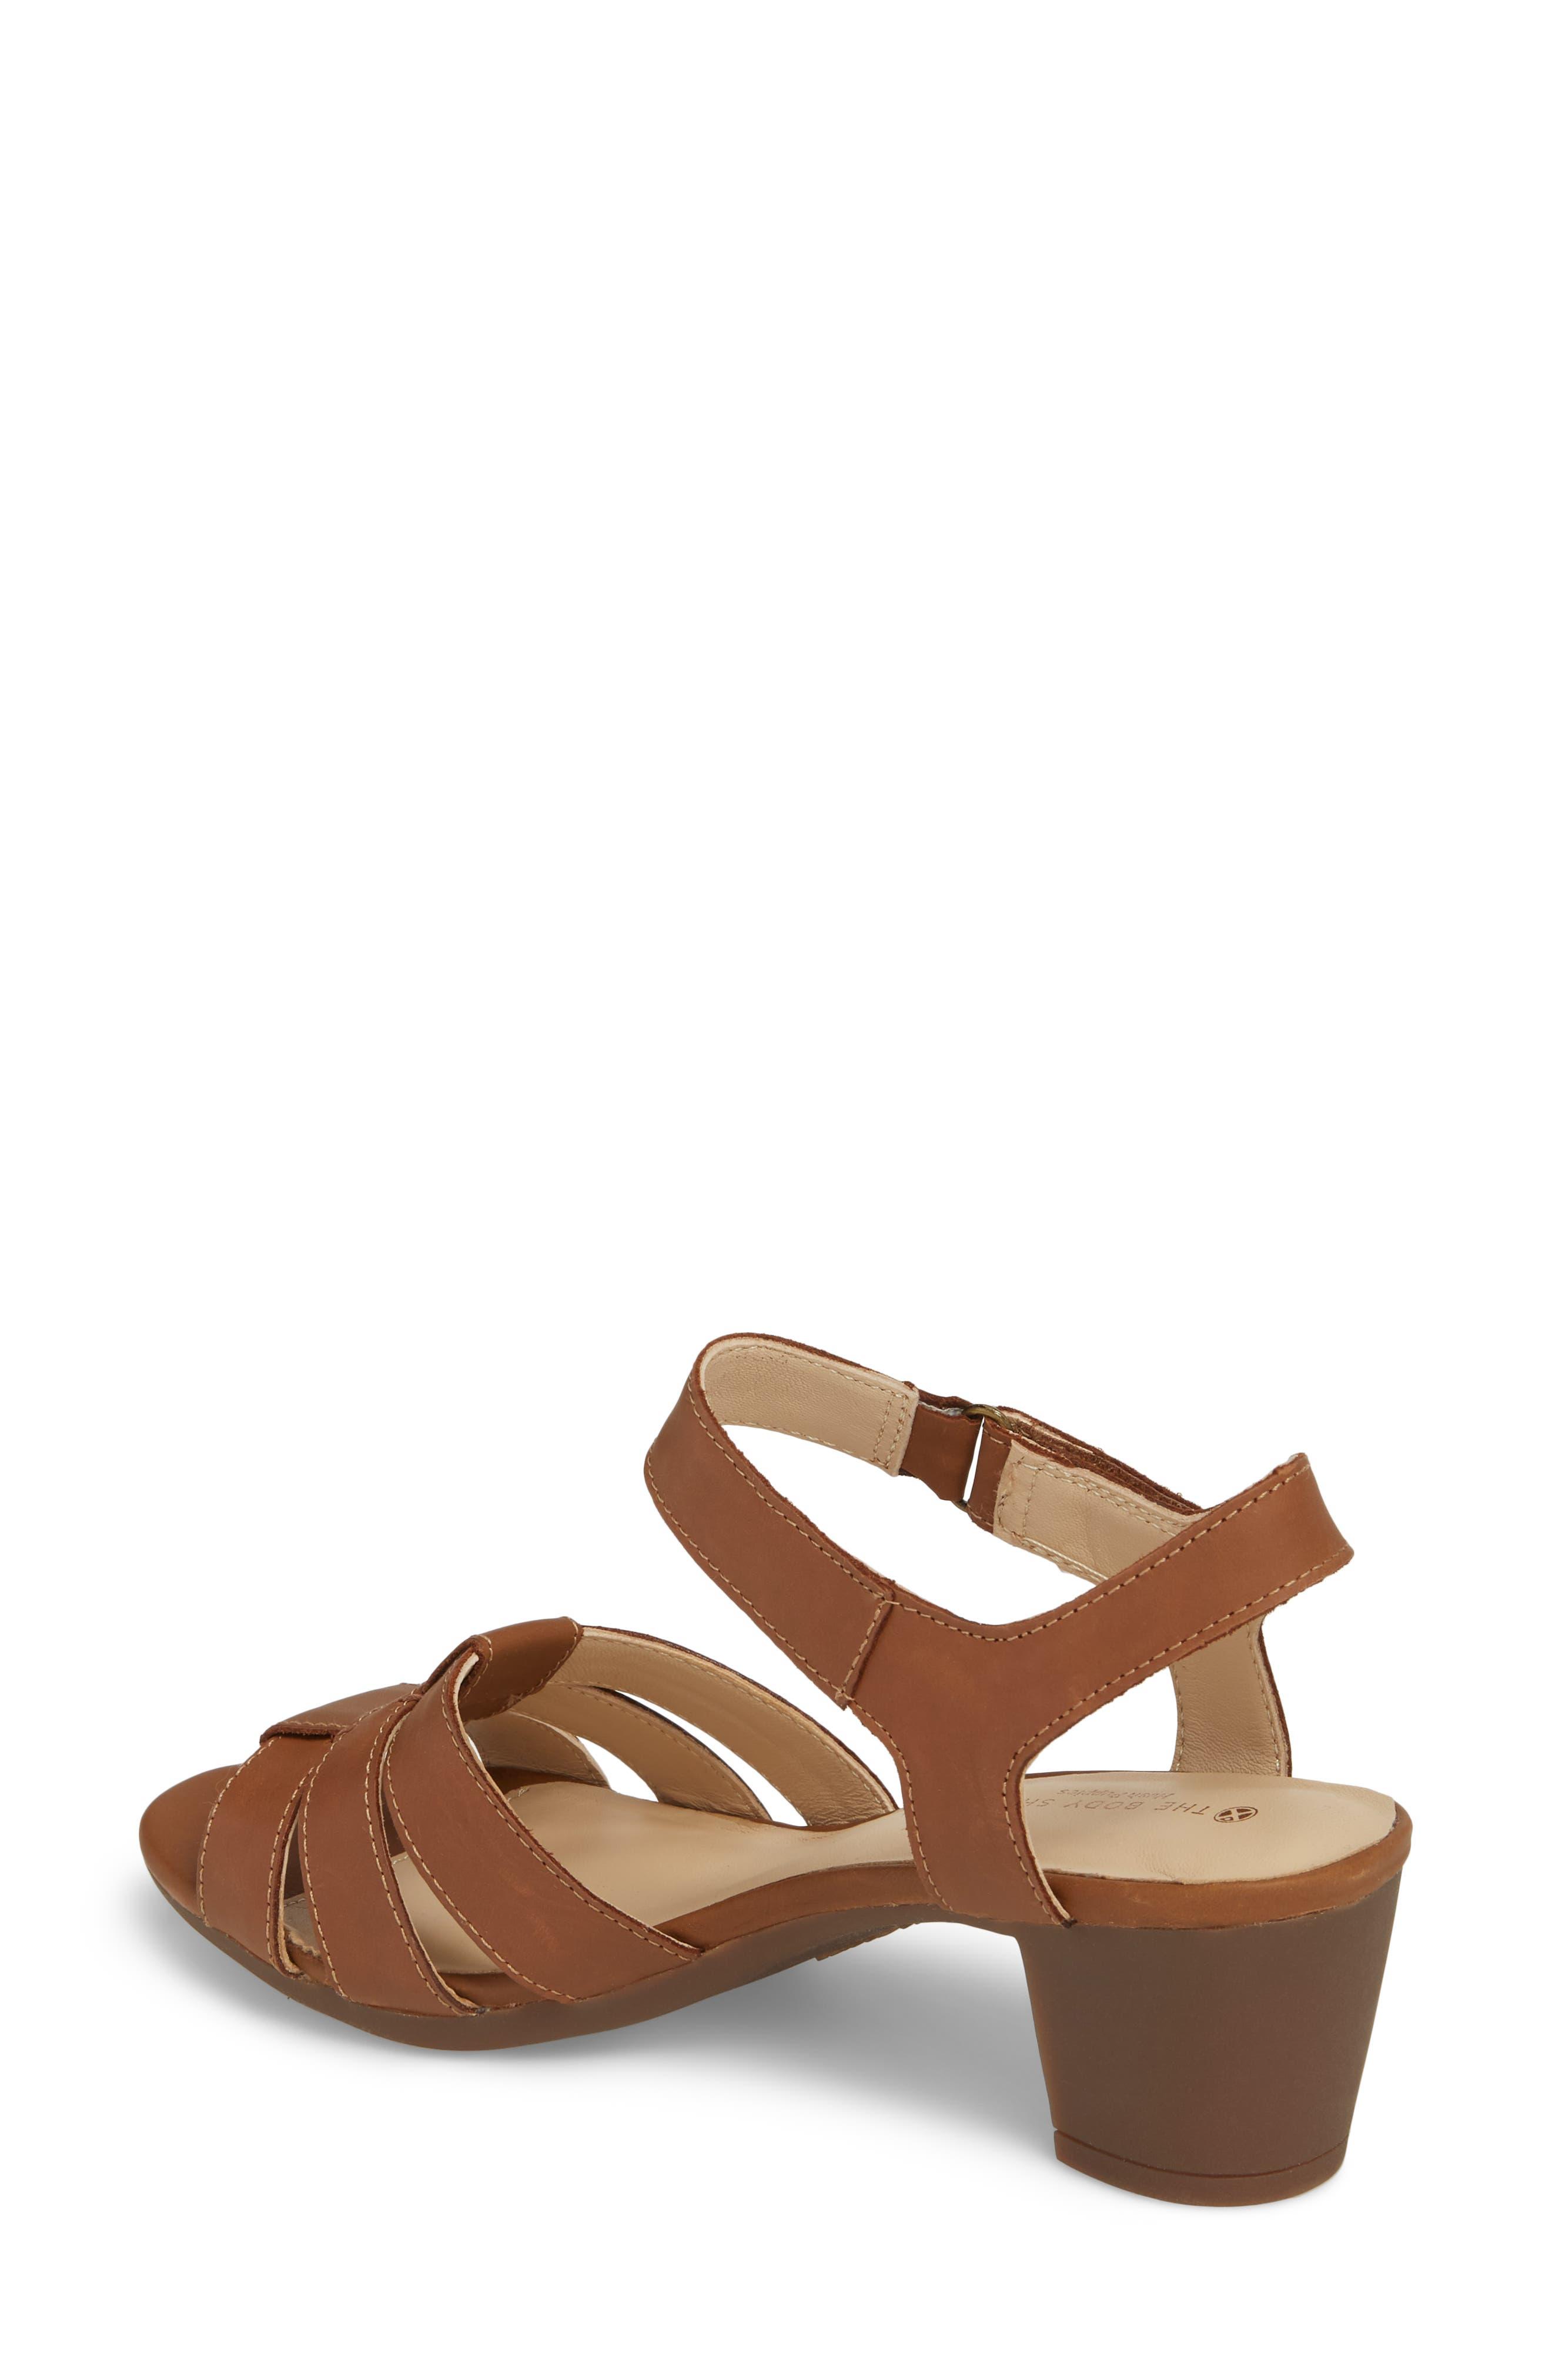 Masseter Quarter Strap Sandal,                             Alternate thumbnail 2, color,                             Tan Leather